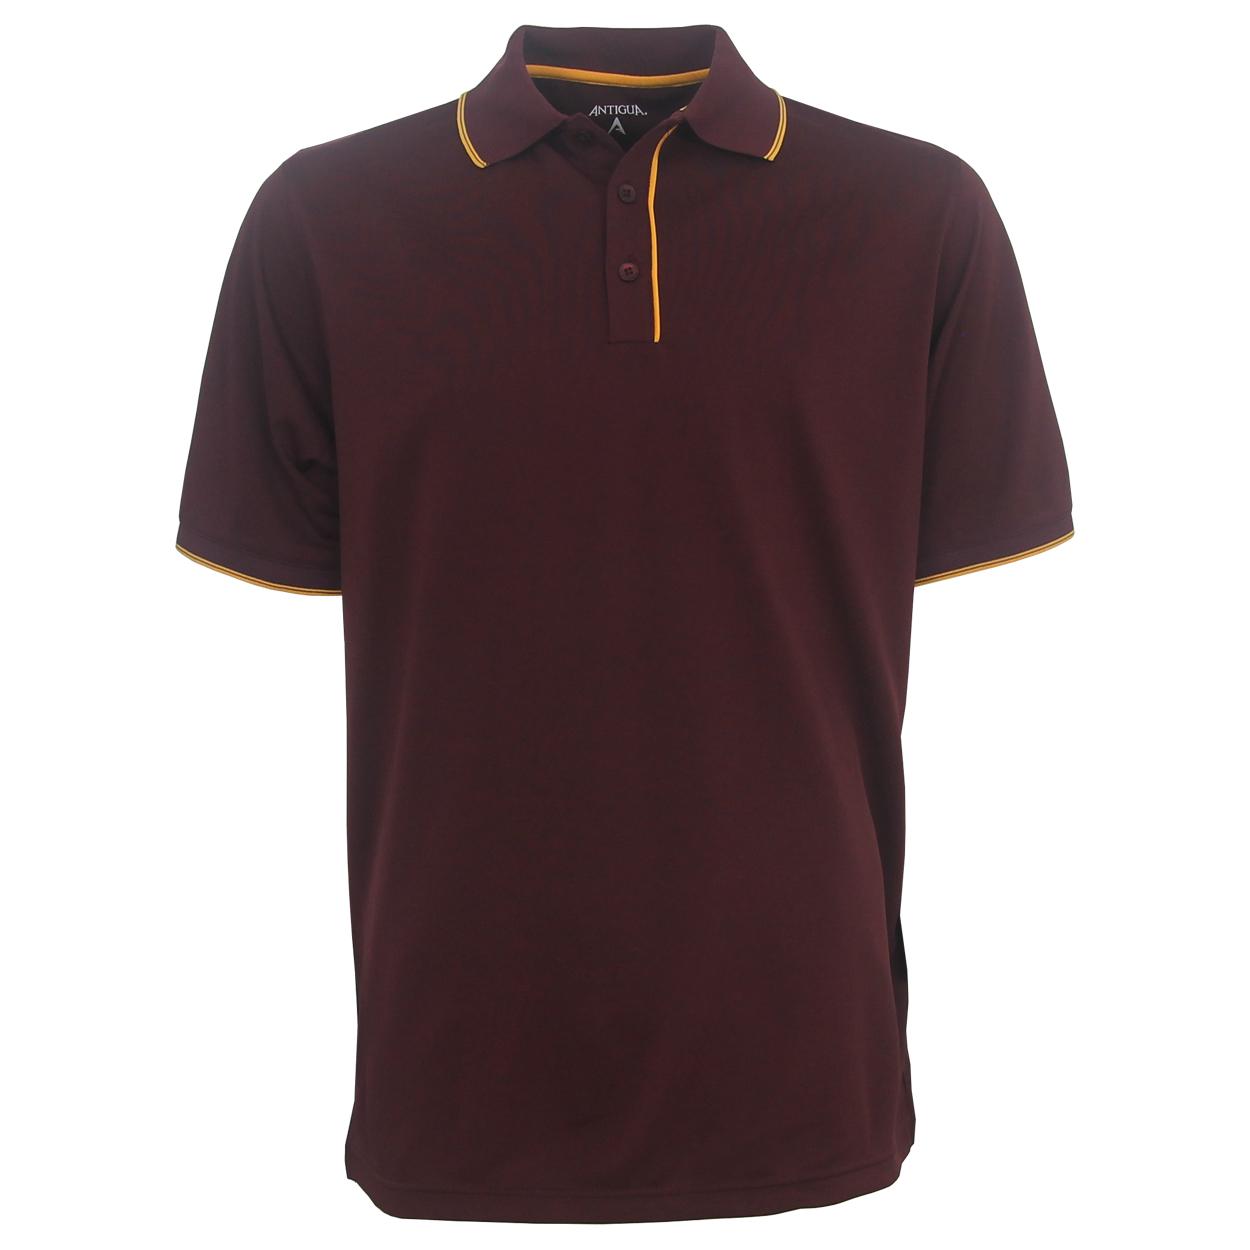 Antigua elite performance polo golf shirt for Polo golf performance shirt